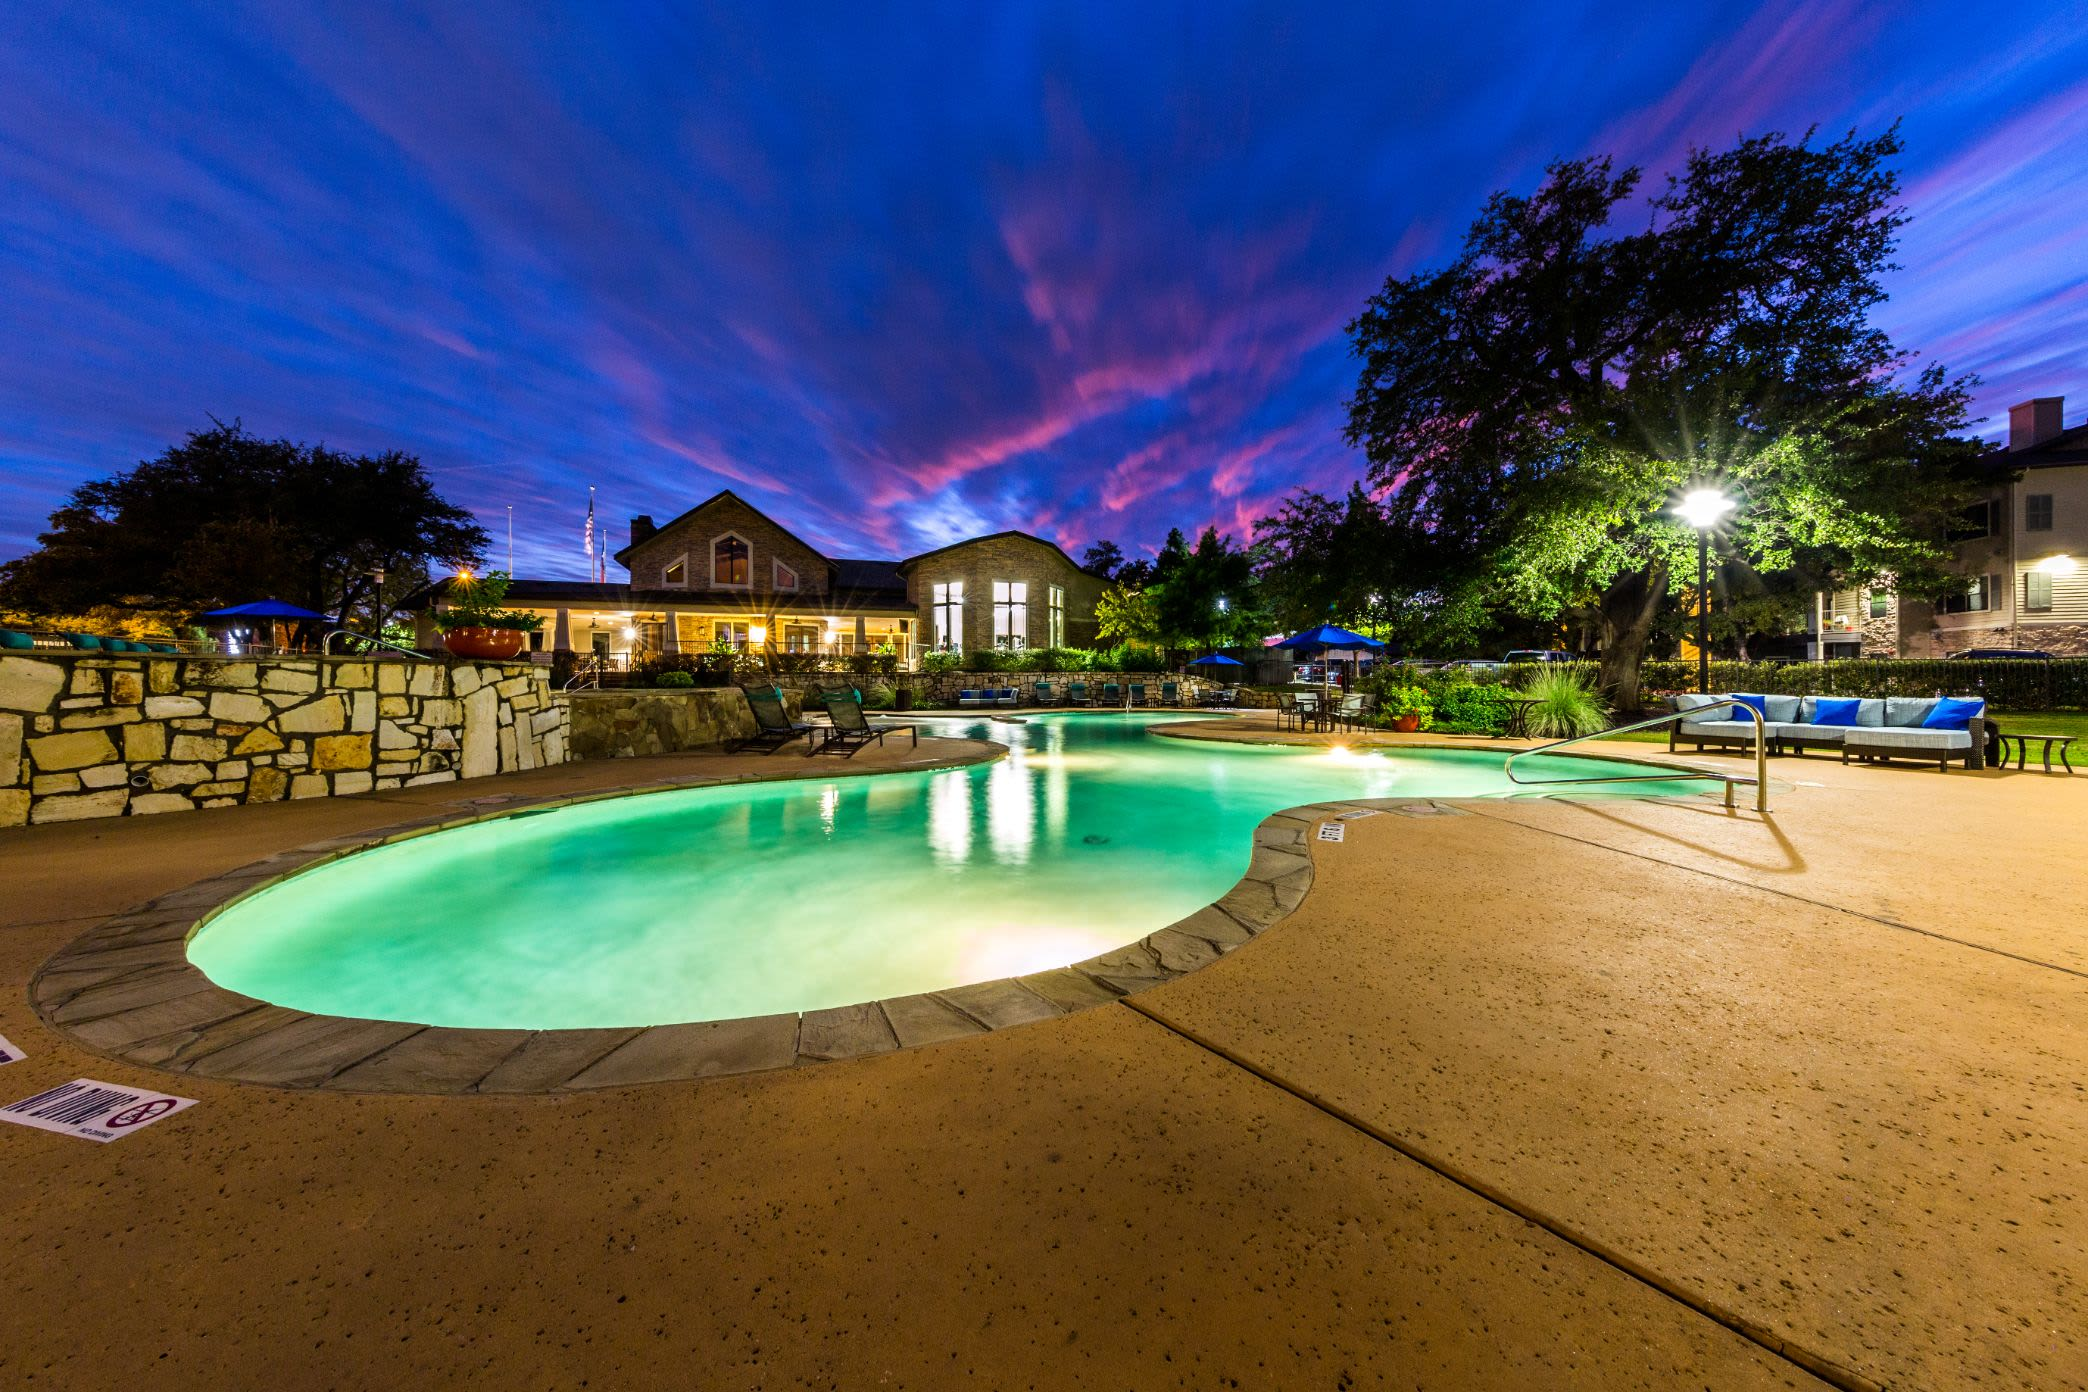 Lit pool beneath purple skies at Marquis on Lakeline in Cedar Park, Texas